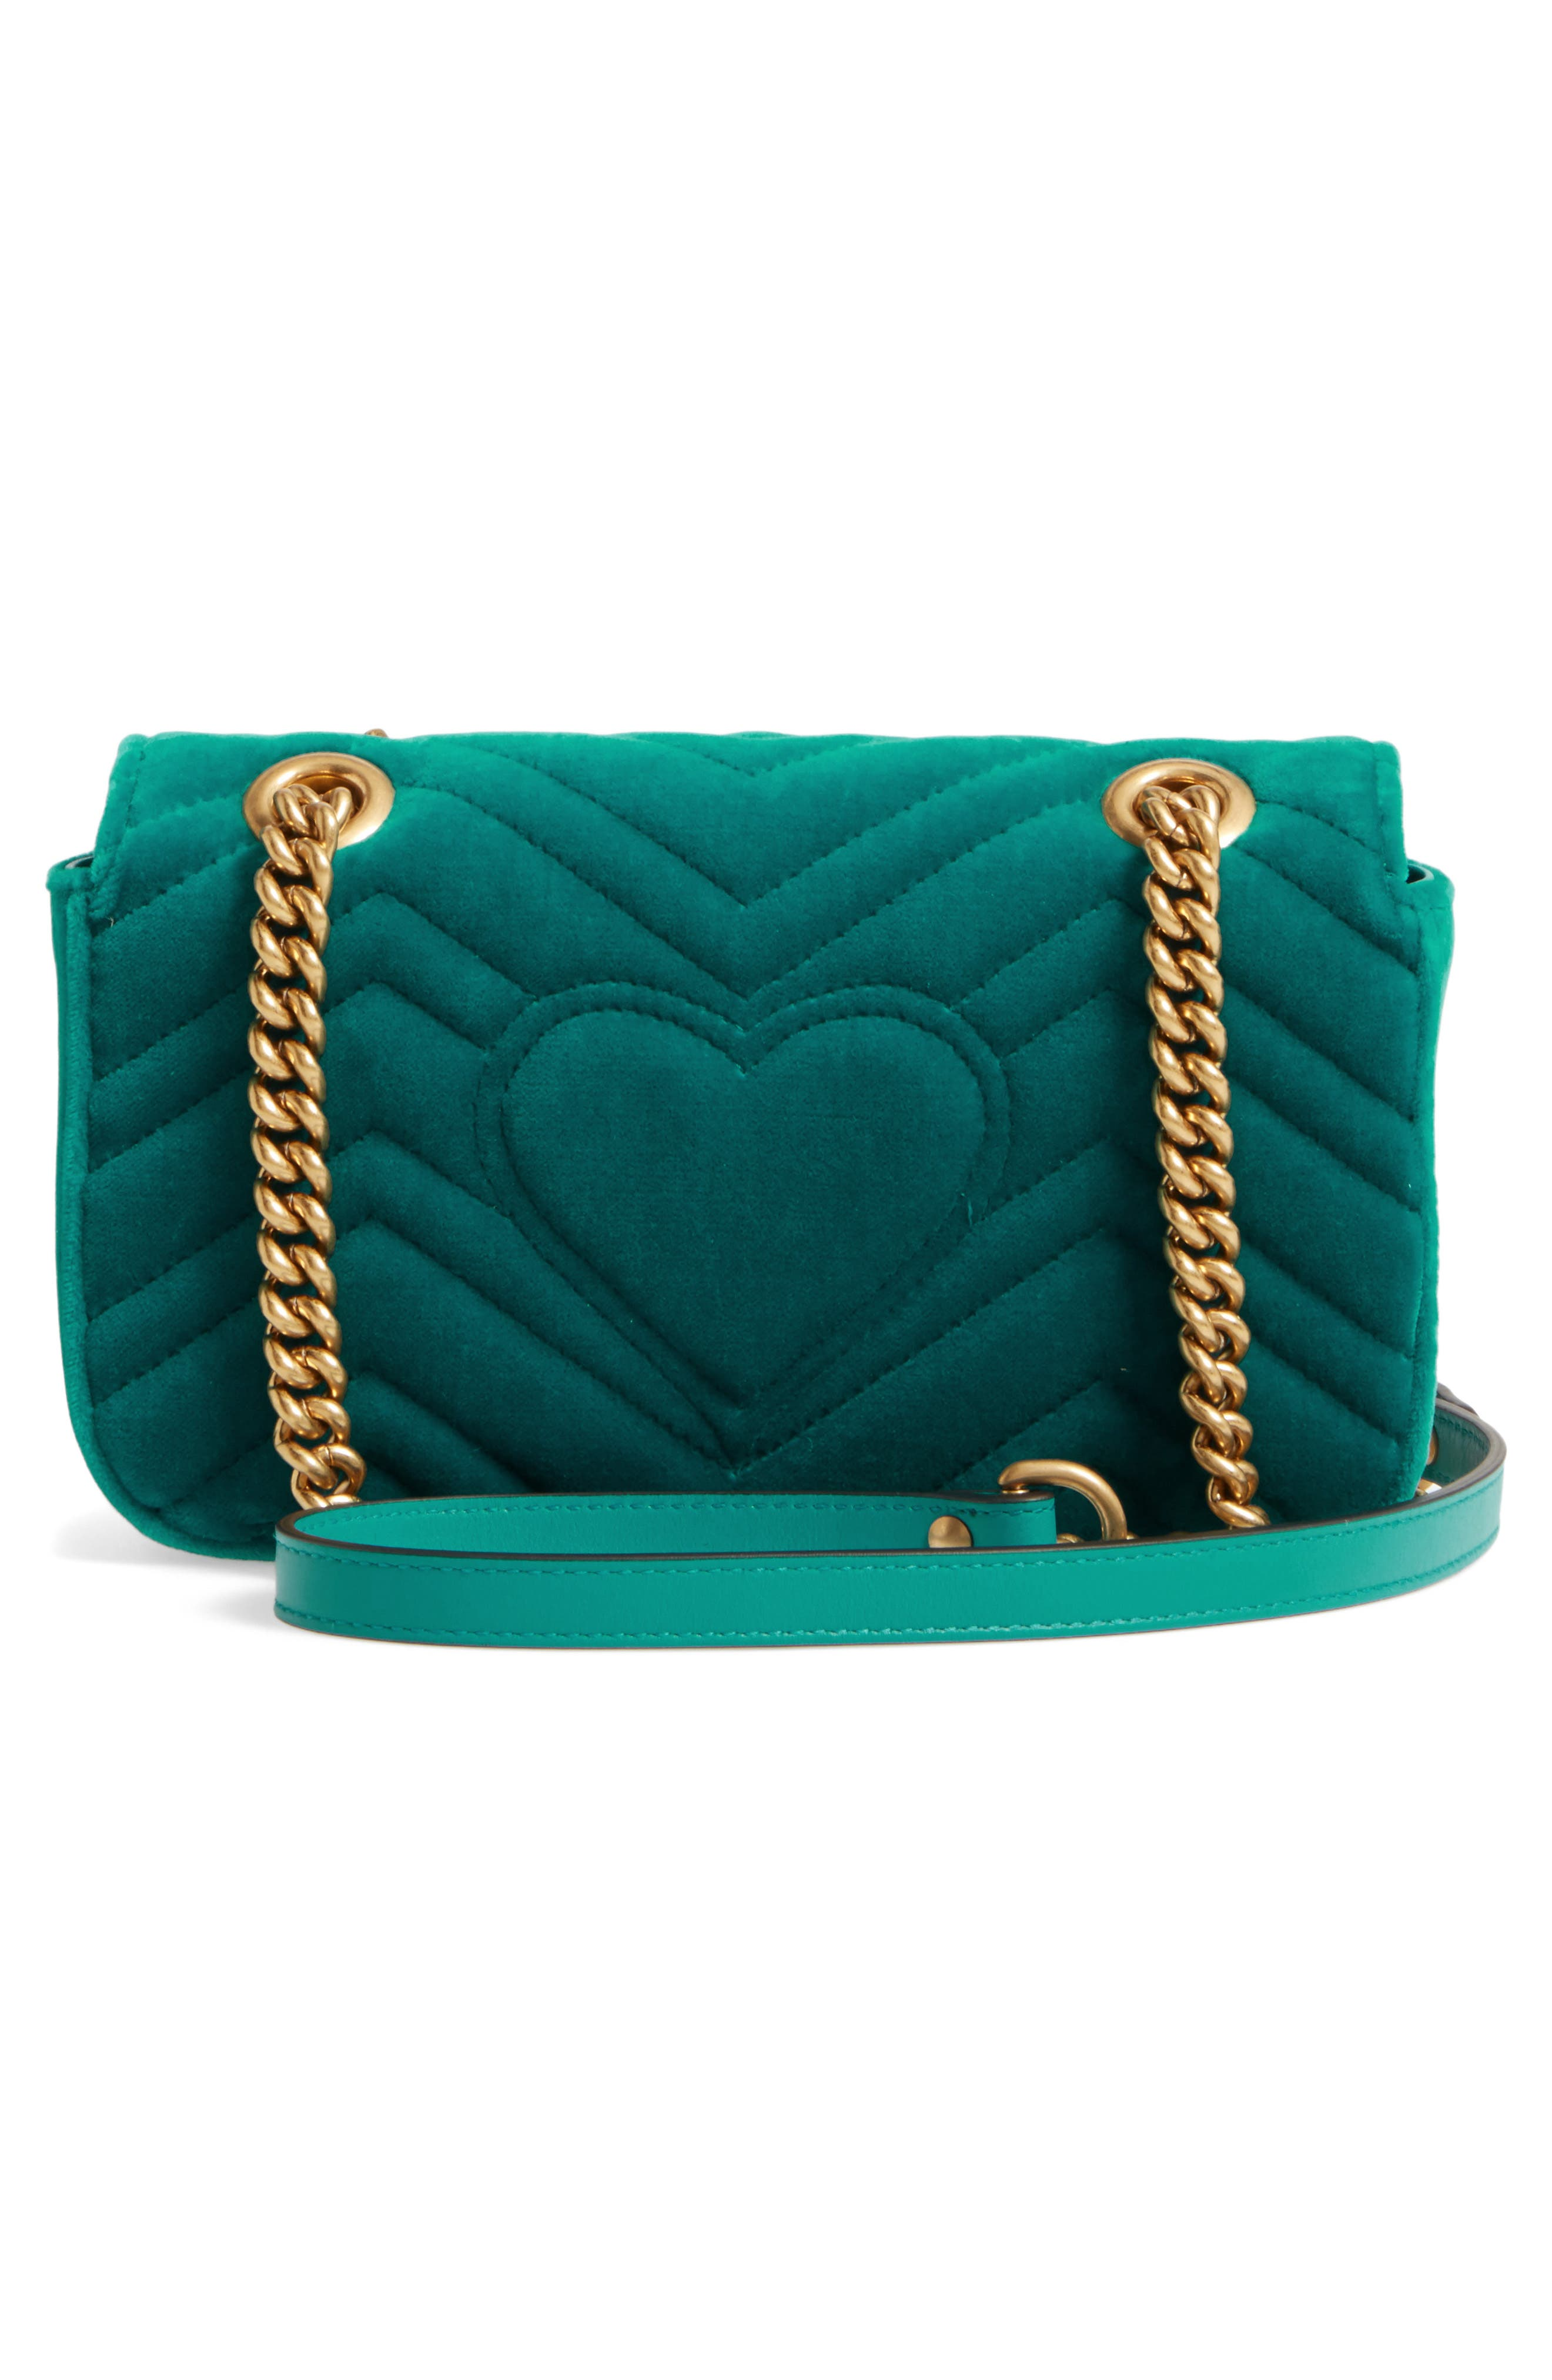 GUCCI, Mini GG Marmont Matelassé Velvet Shoulder Bag, Alternate thumbnail 3, color, PIVONE